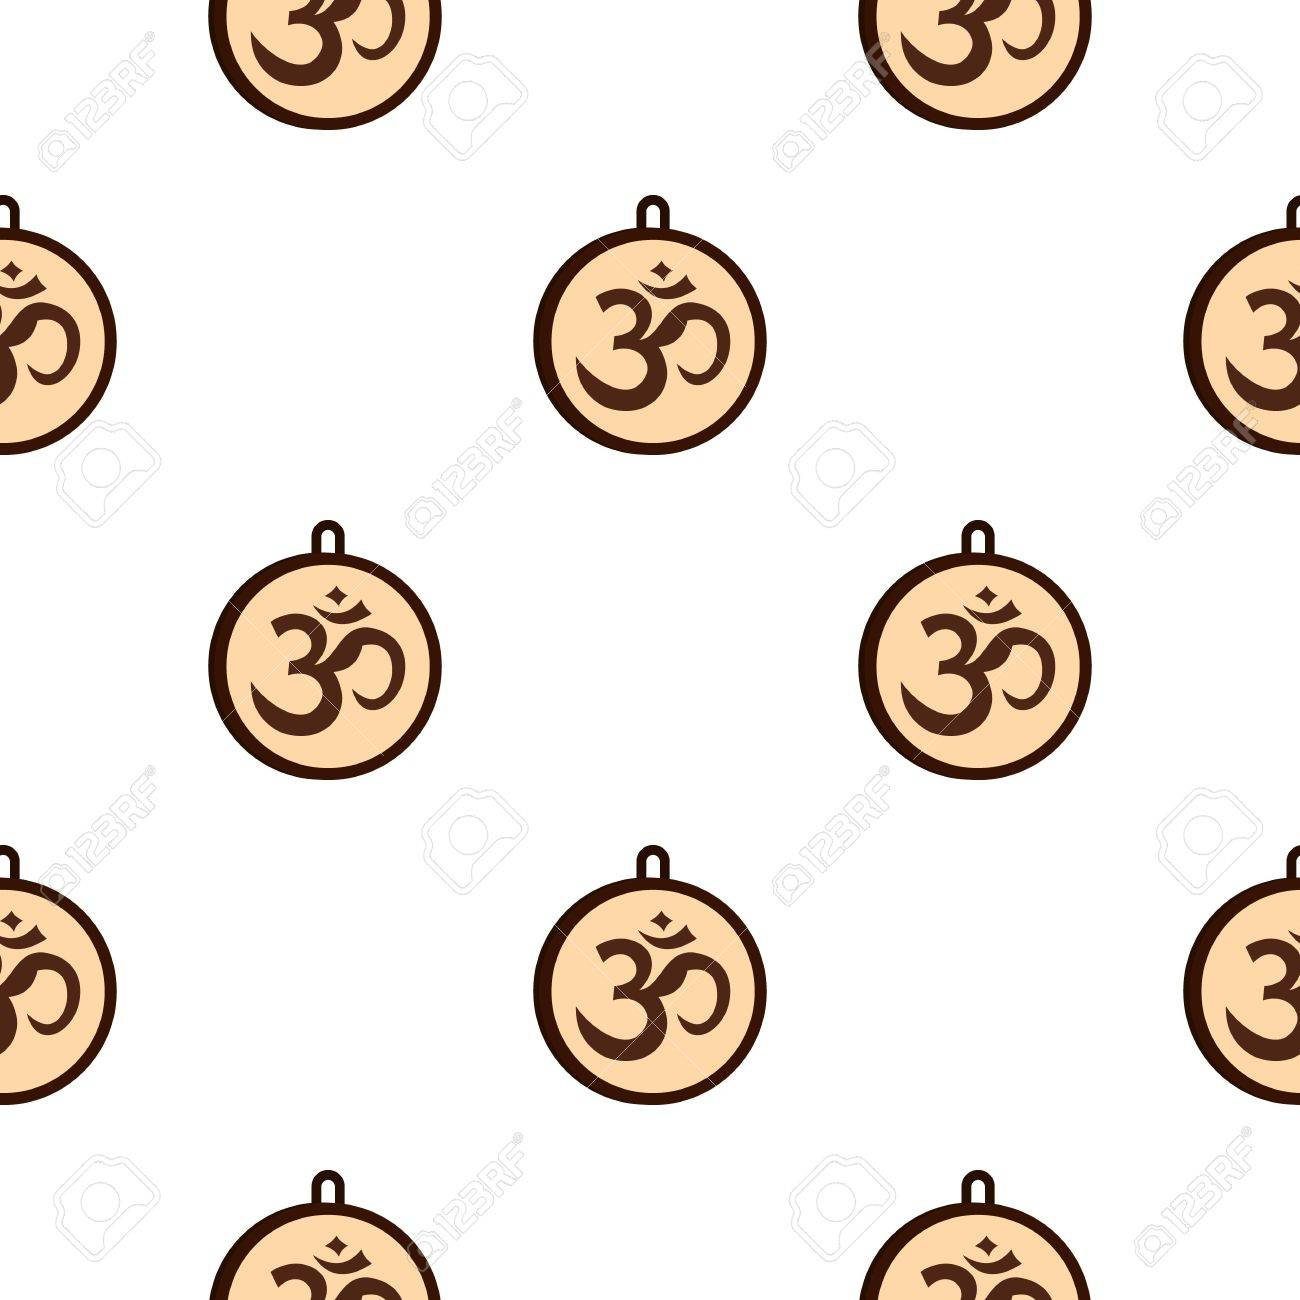 Hindu Om Symbol Pattern Seamless For Any Design Vector Illustration